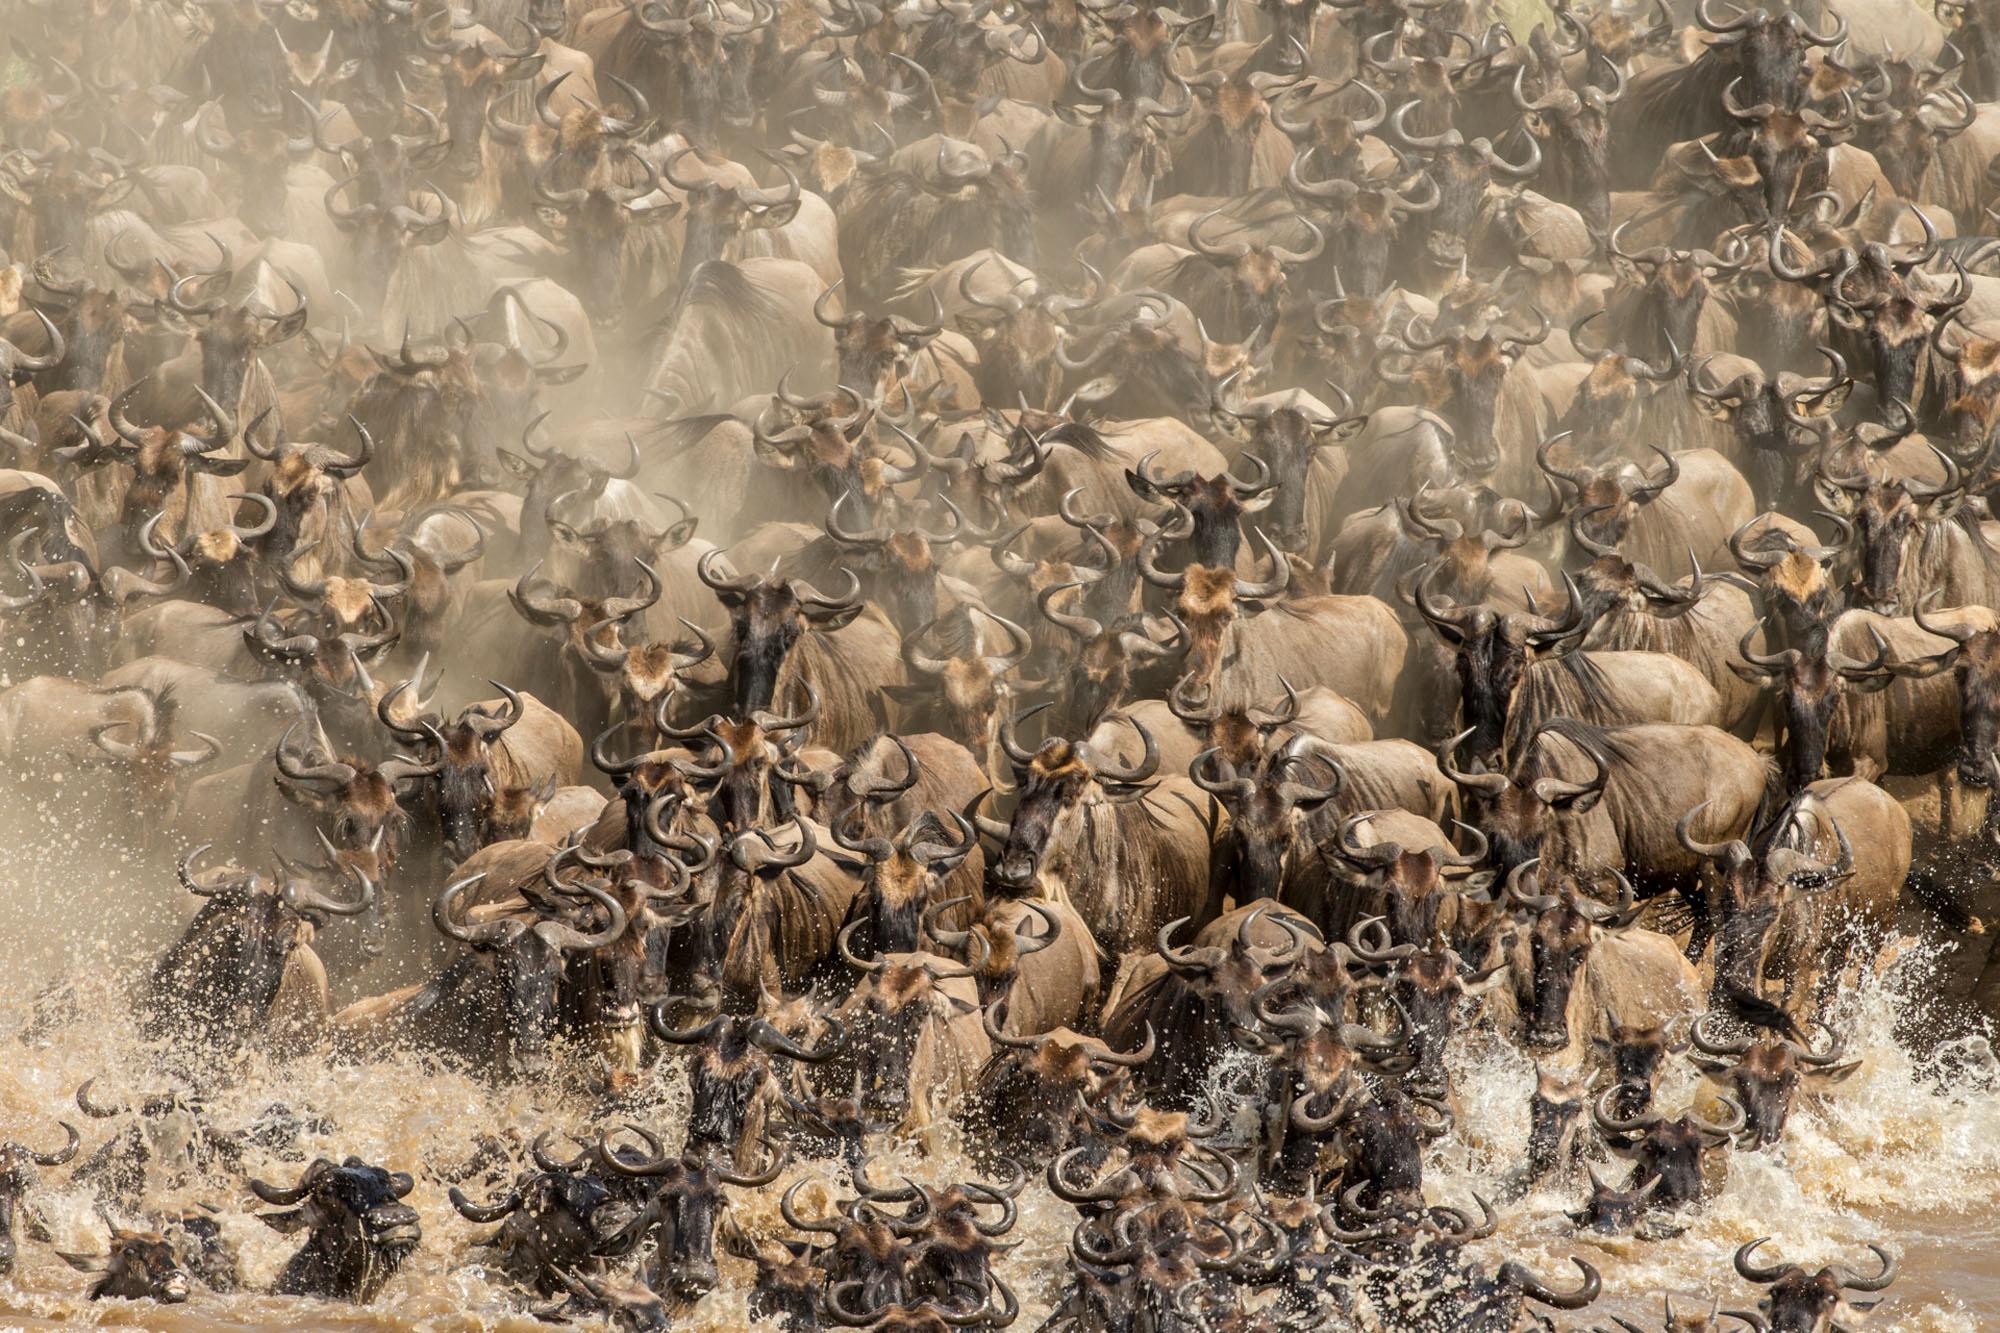 Wildlife World Photography Organisation - 12 amazing photos from the 2016 sony photography awards